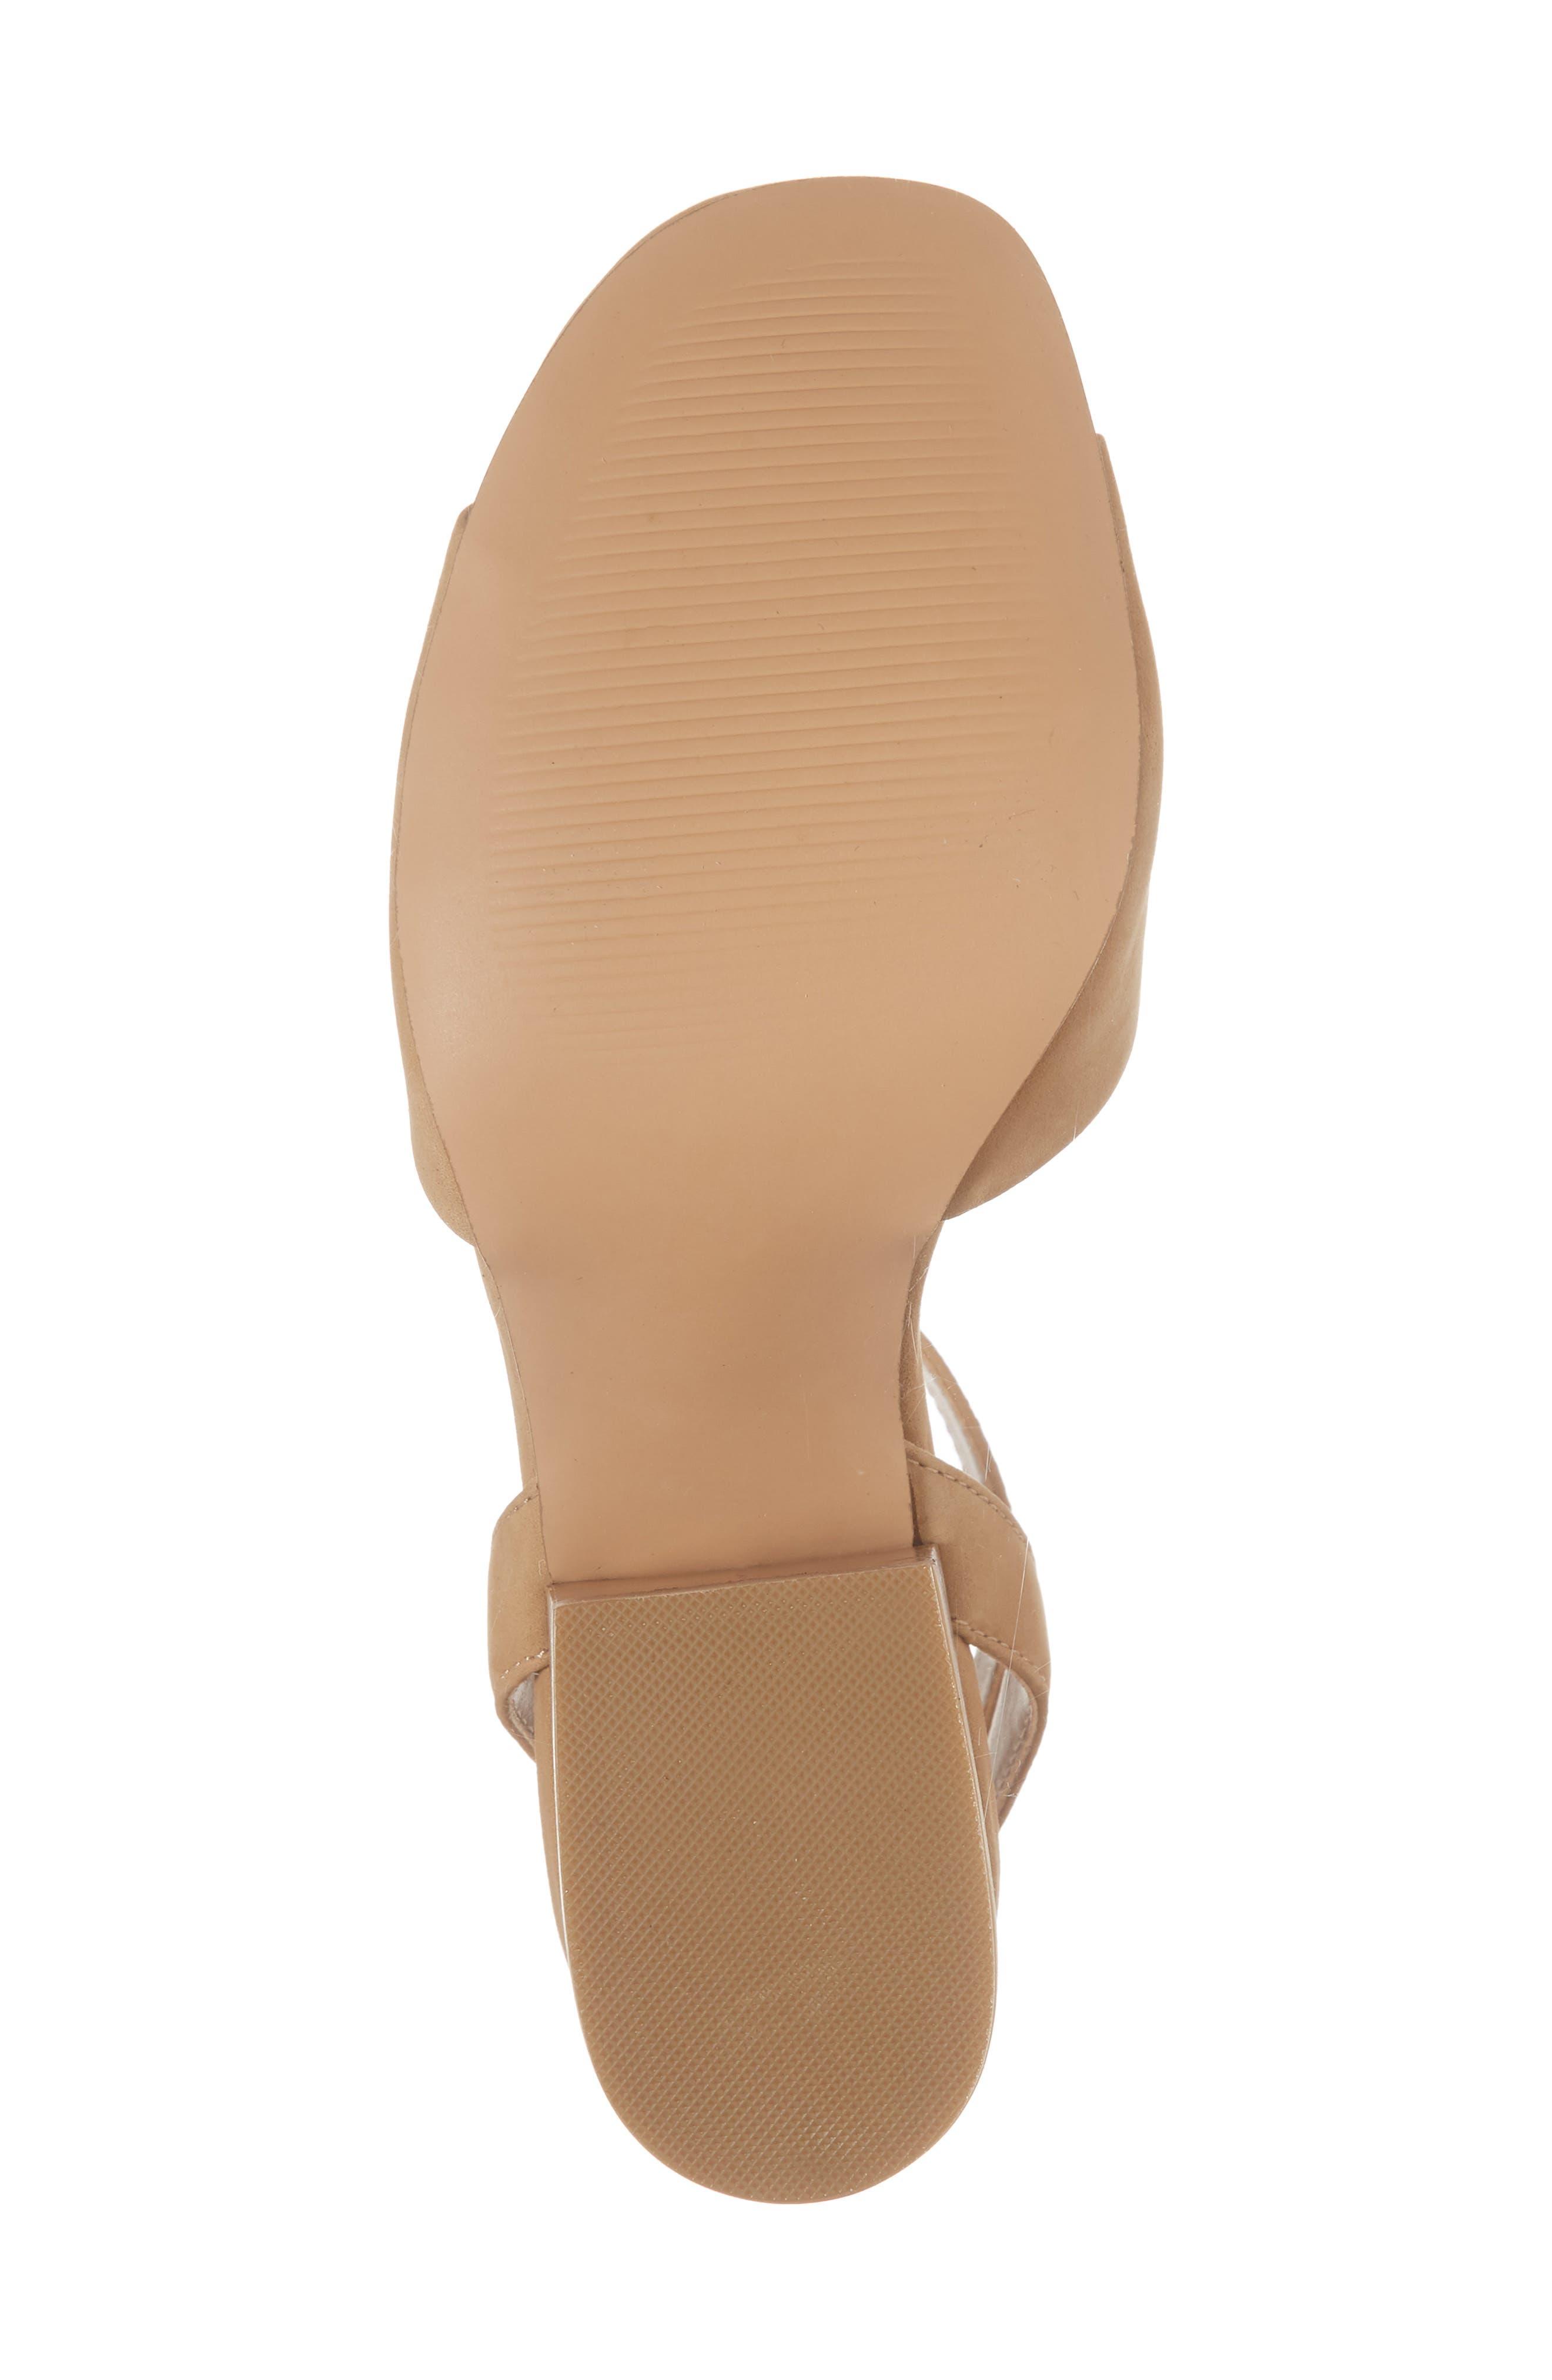 Devlin Block Heel Sandal,                             Alternate thumbnail 6, color,                             200